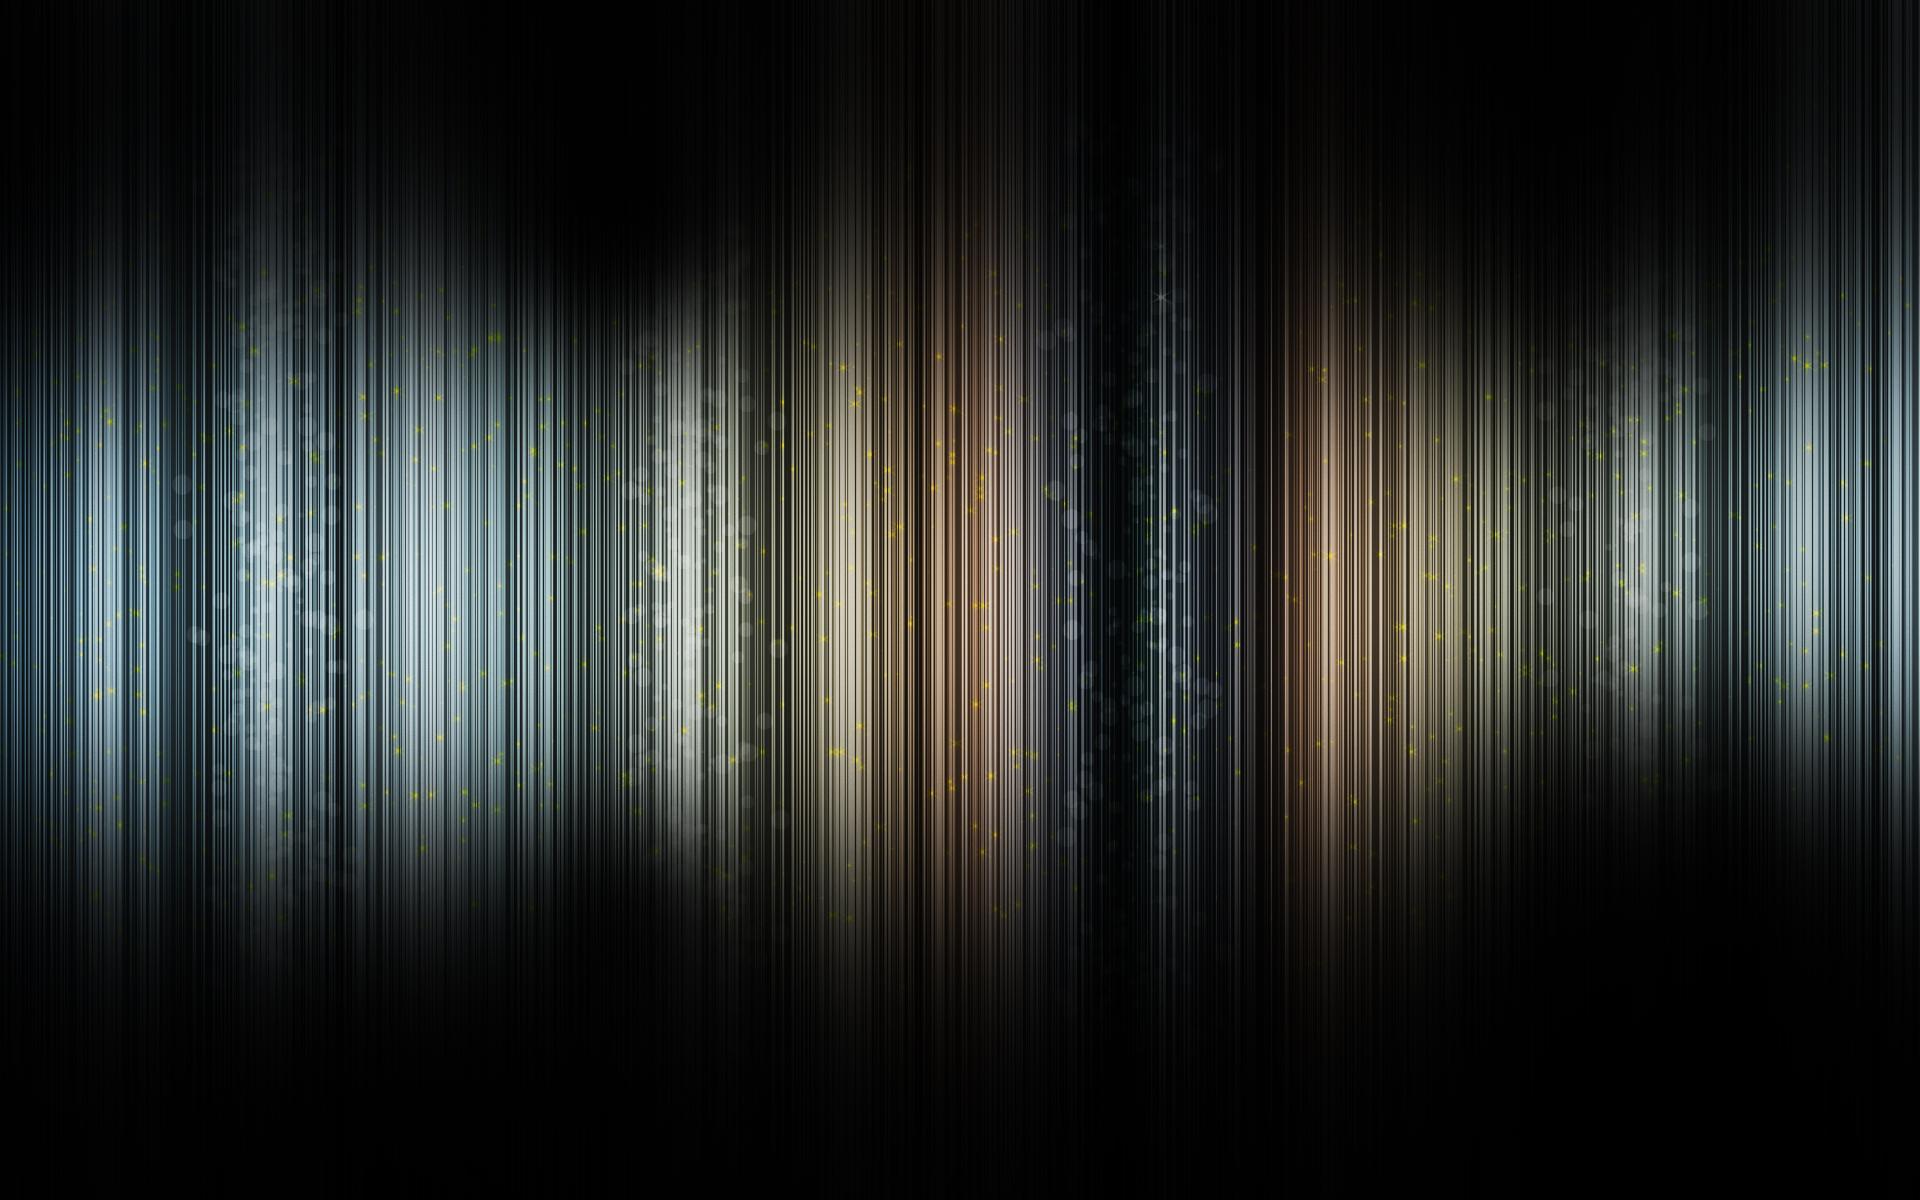 abstract wallpaper 1920x1200 1920x1200